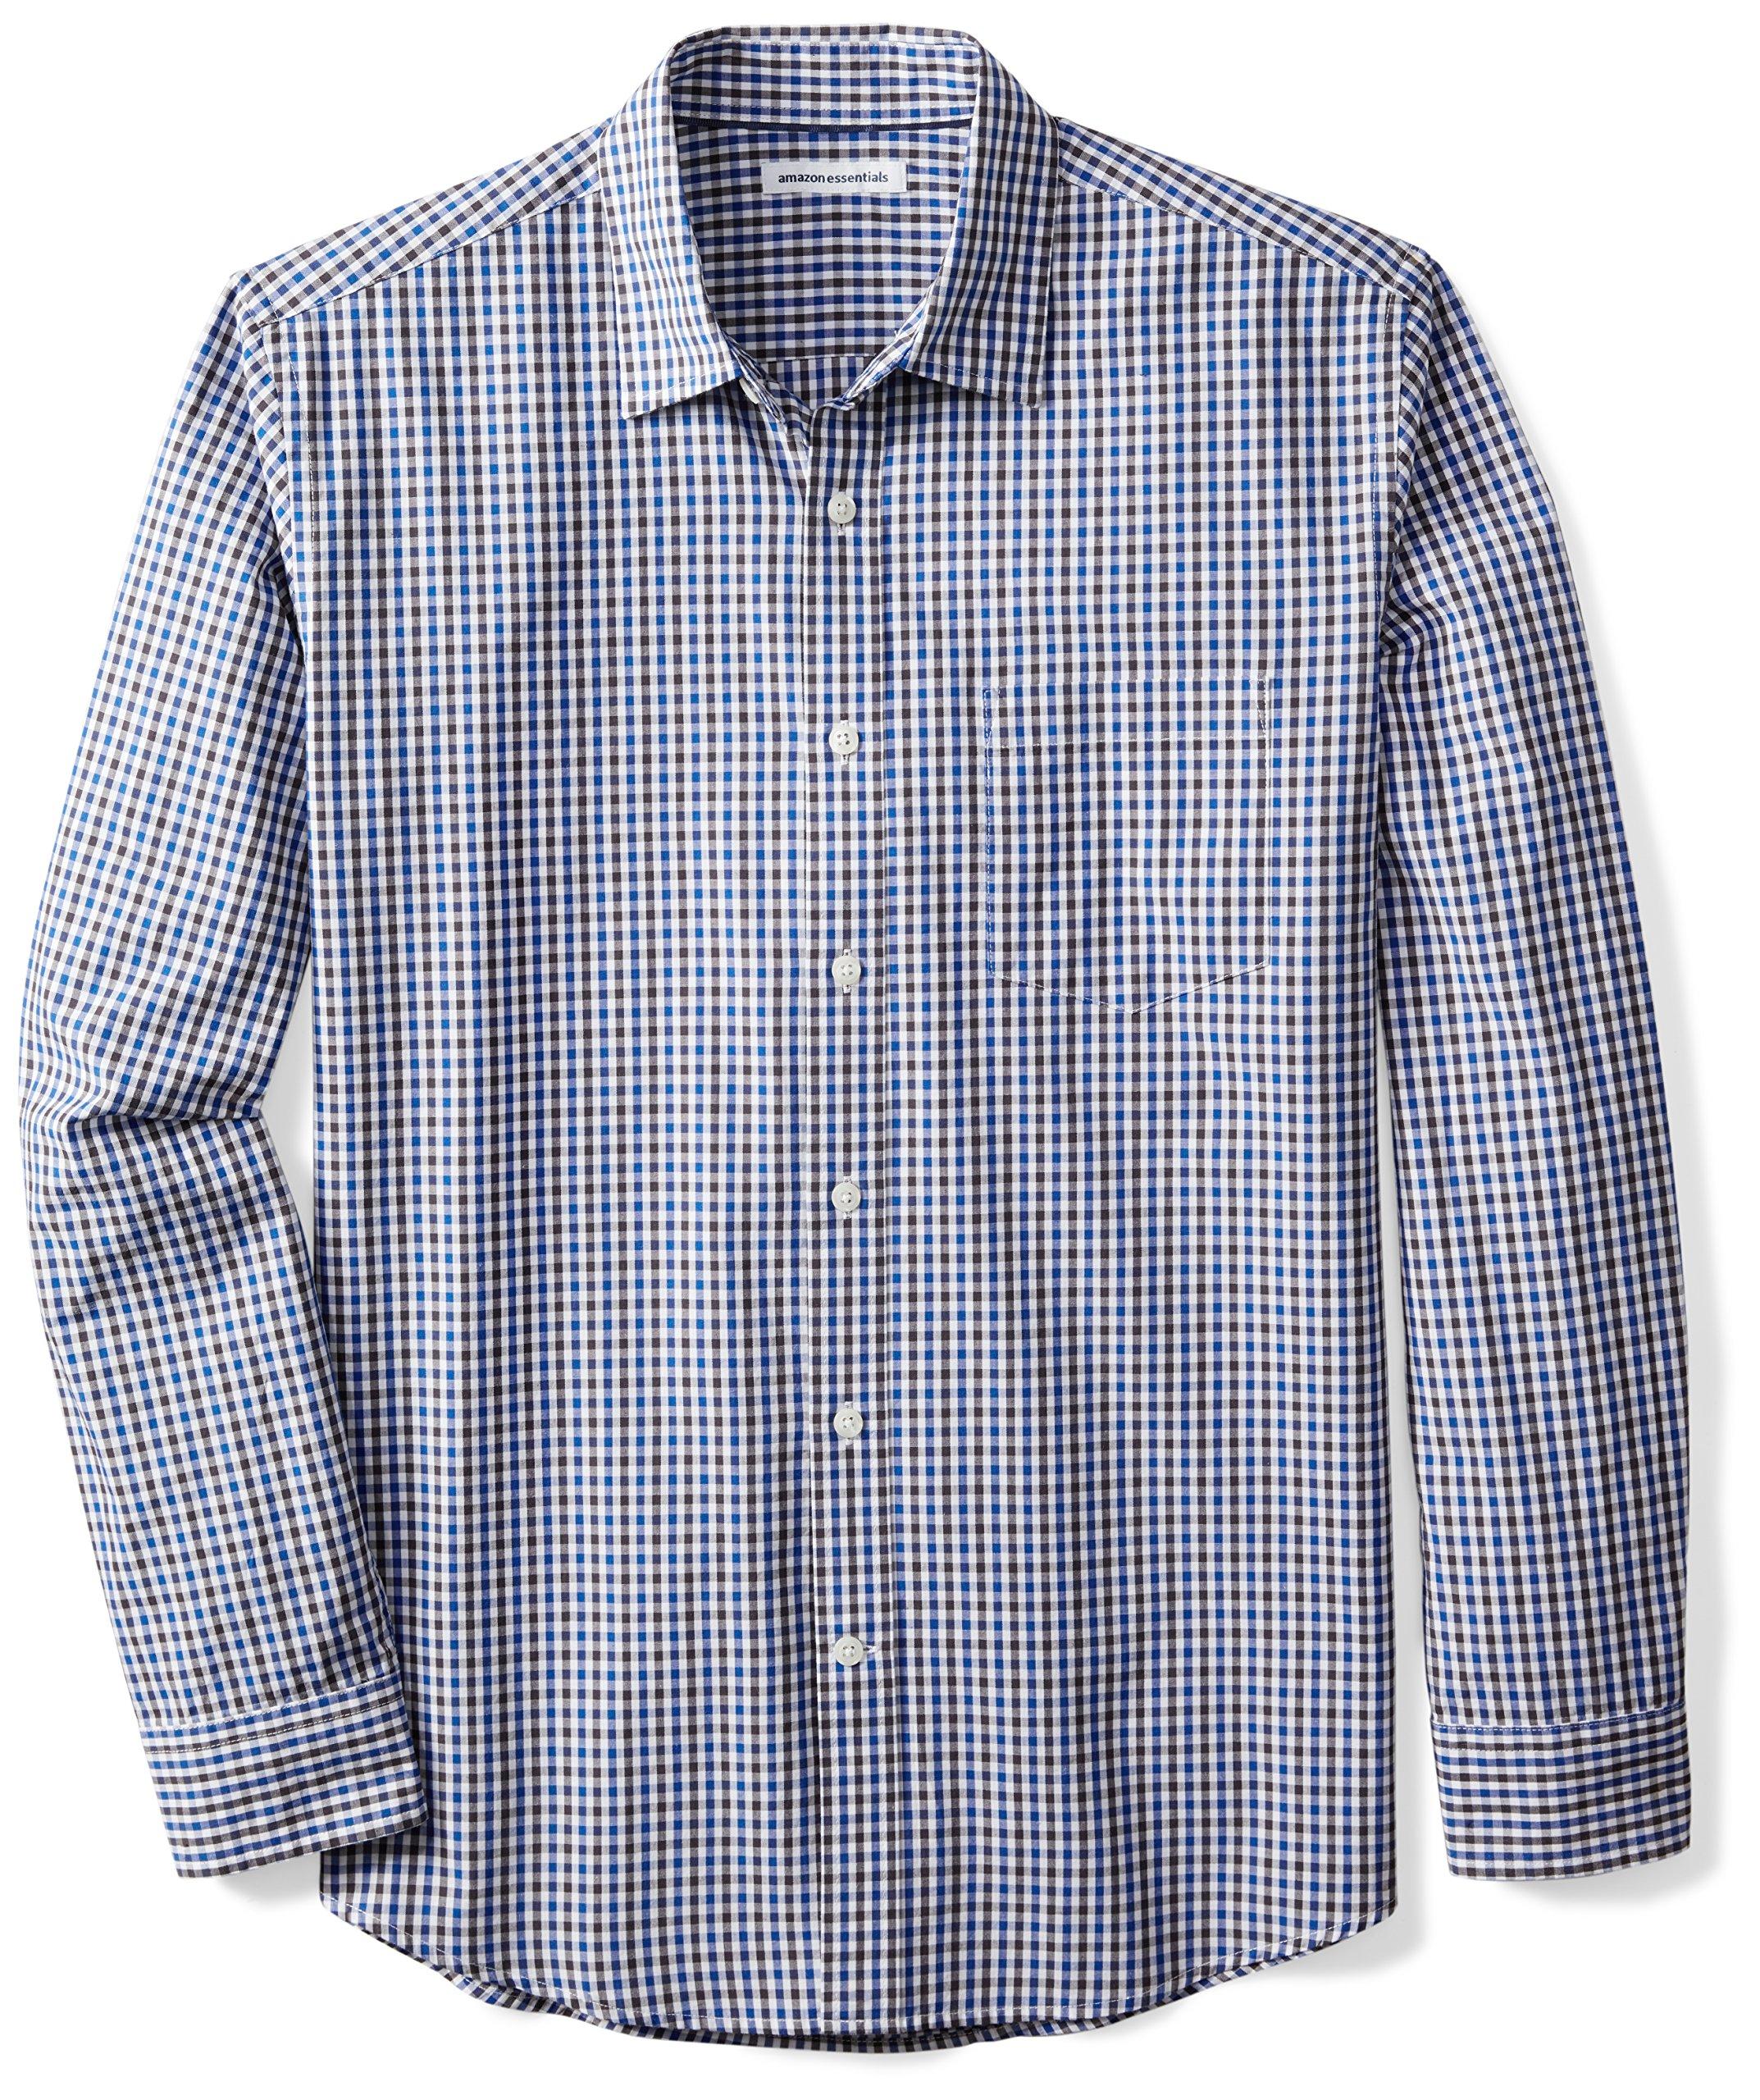 Amazon Essentials Men's Regular-Fit Long-Sleeve Gingham Shirt, Blue/Black Gingham, X-Large by Amazon Essentials